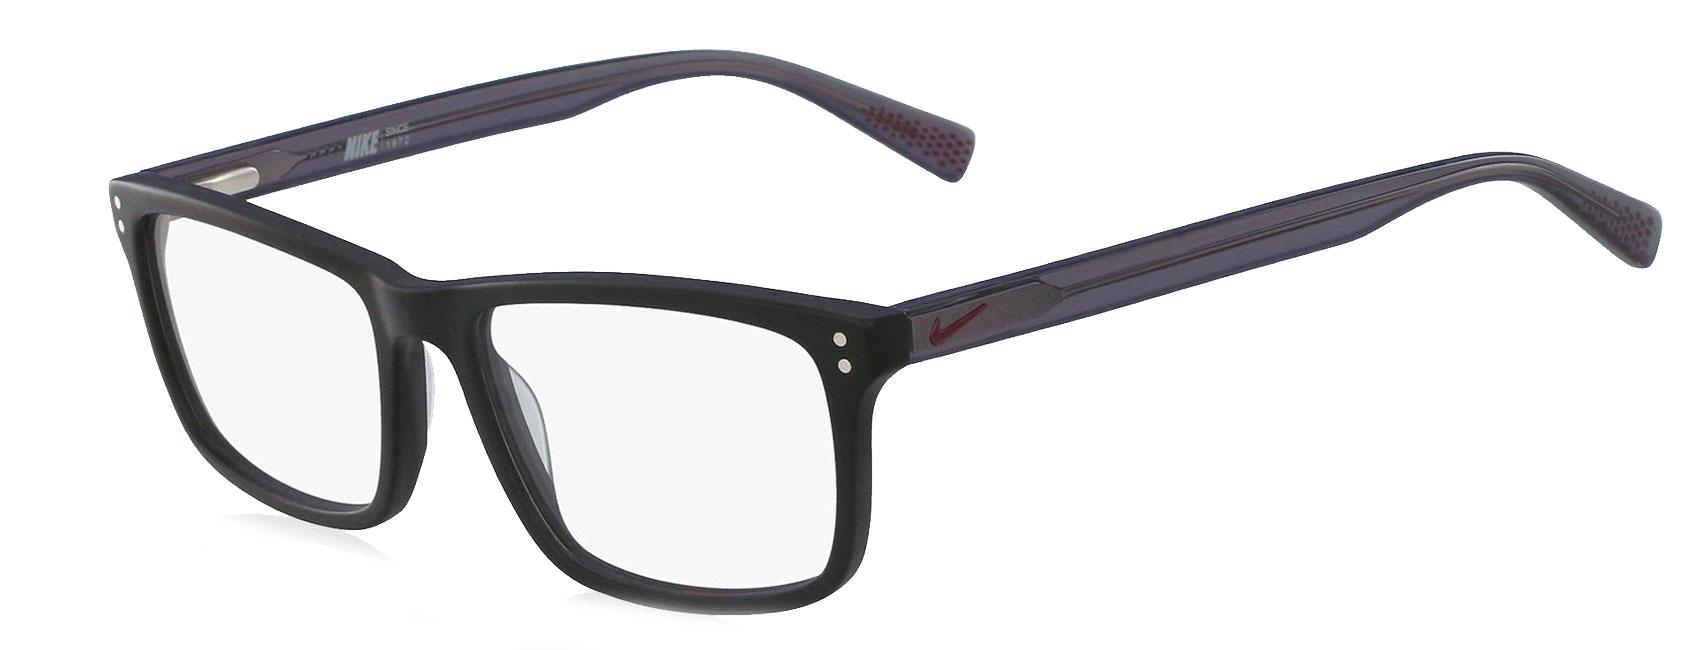 Nike Lead Glasses 7238 Matte Black Grey